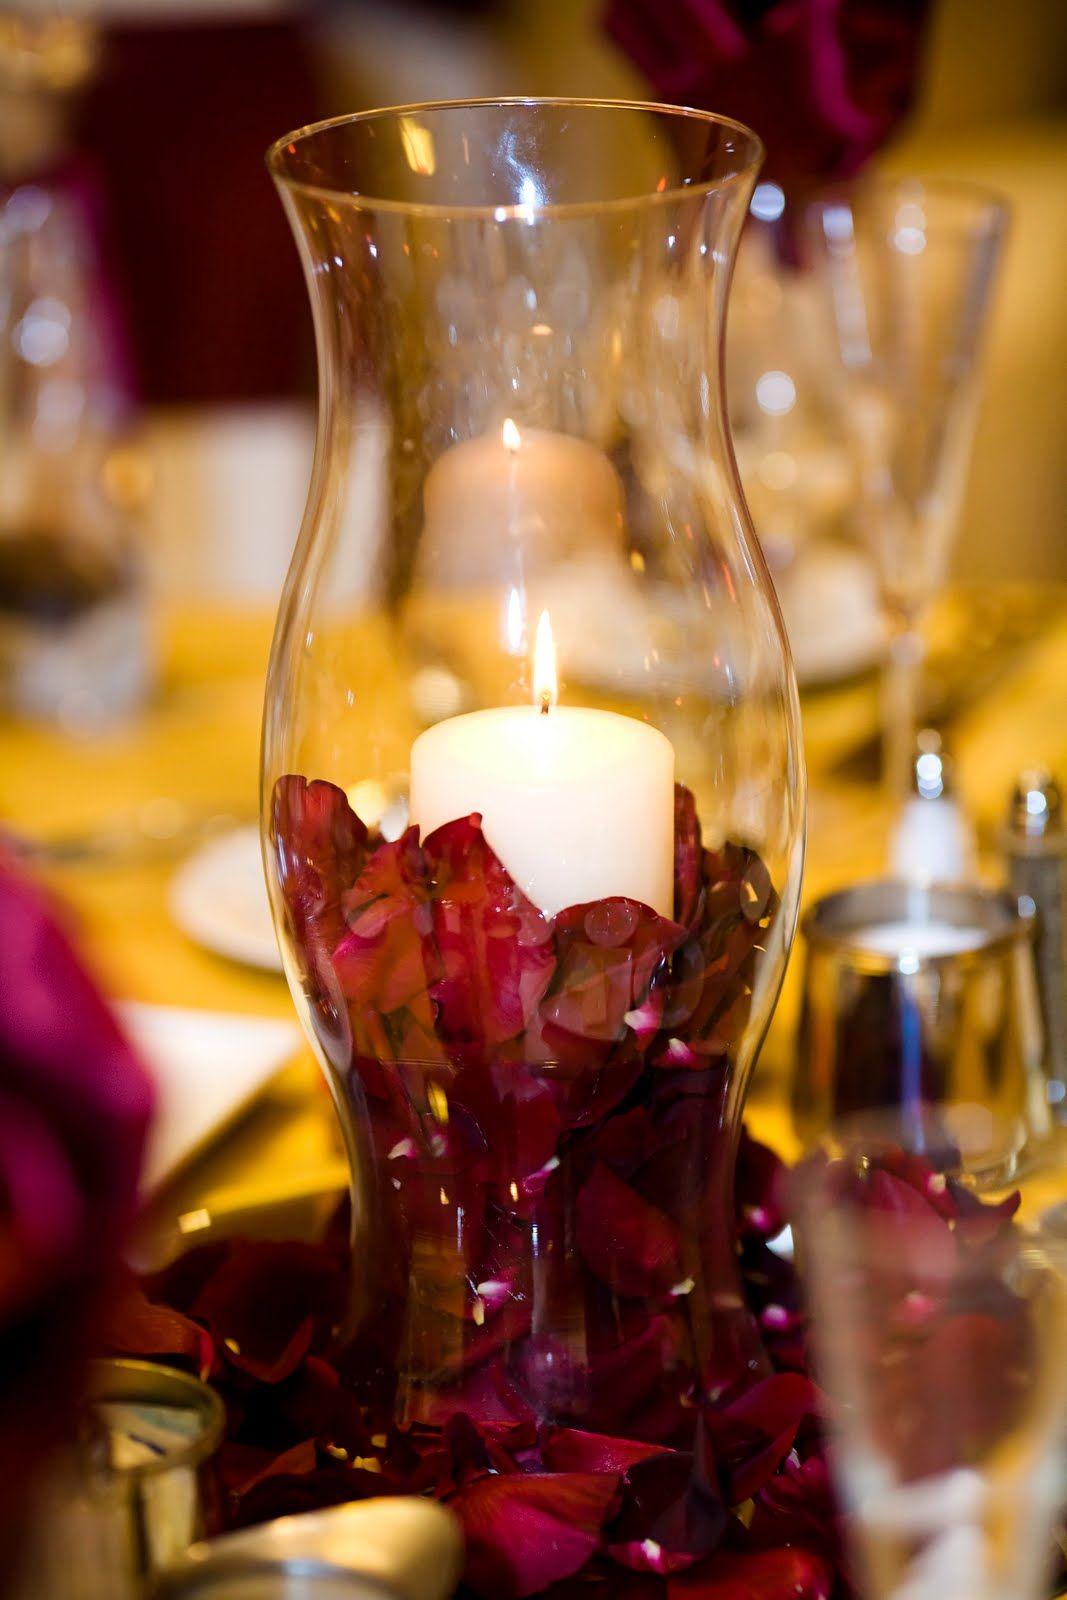 Hurricane vase flowers centerpiece ideas for weddings wedding hurricane vase flowers centerpiece ideas for weddings reviewsmspy